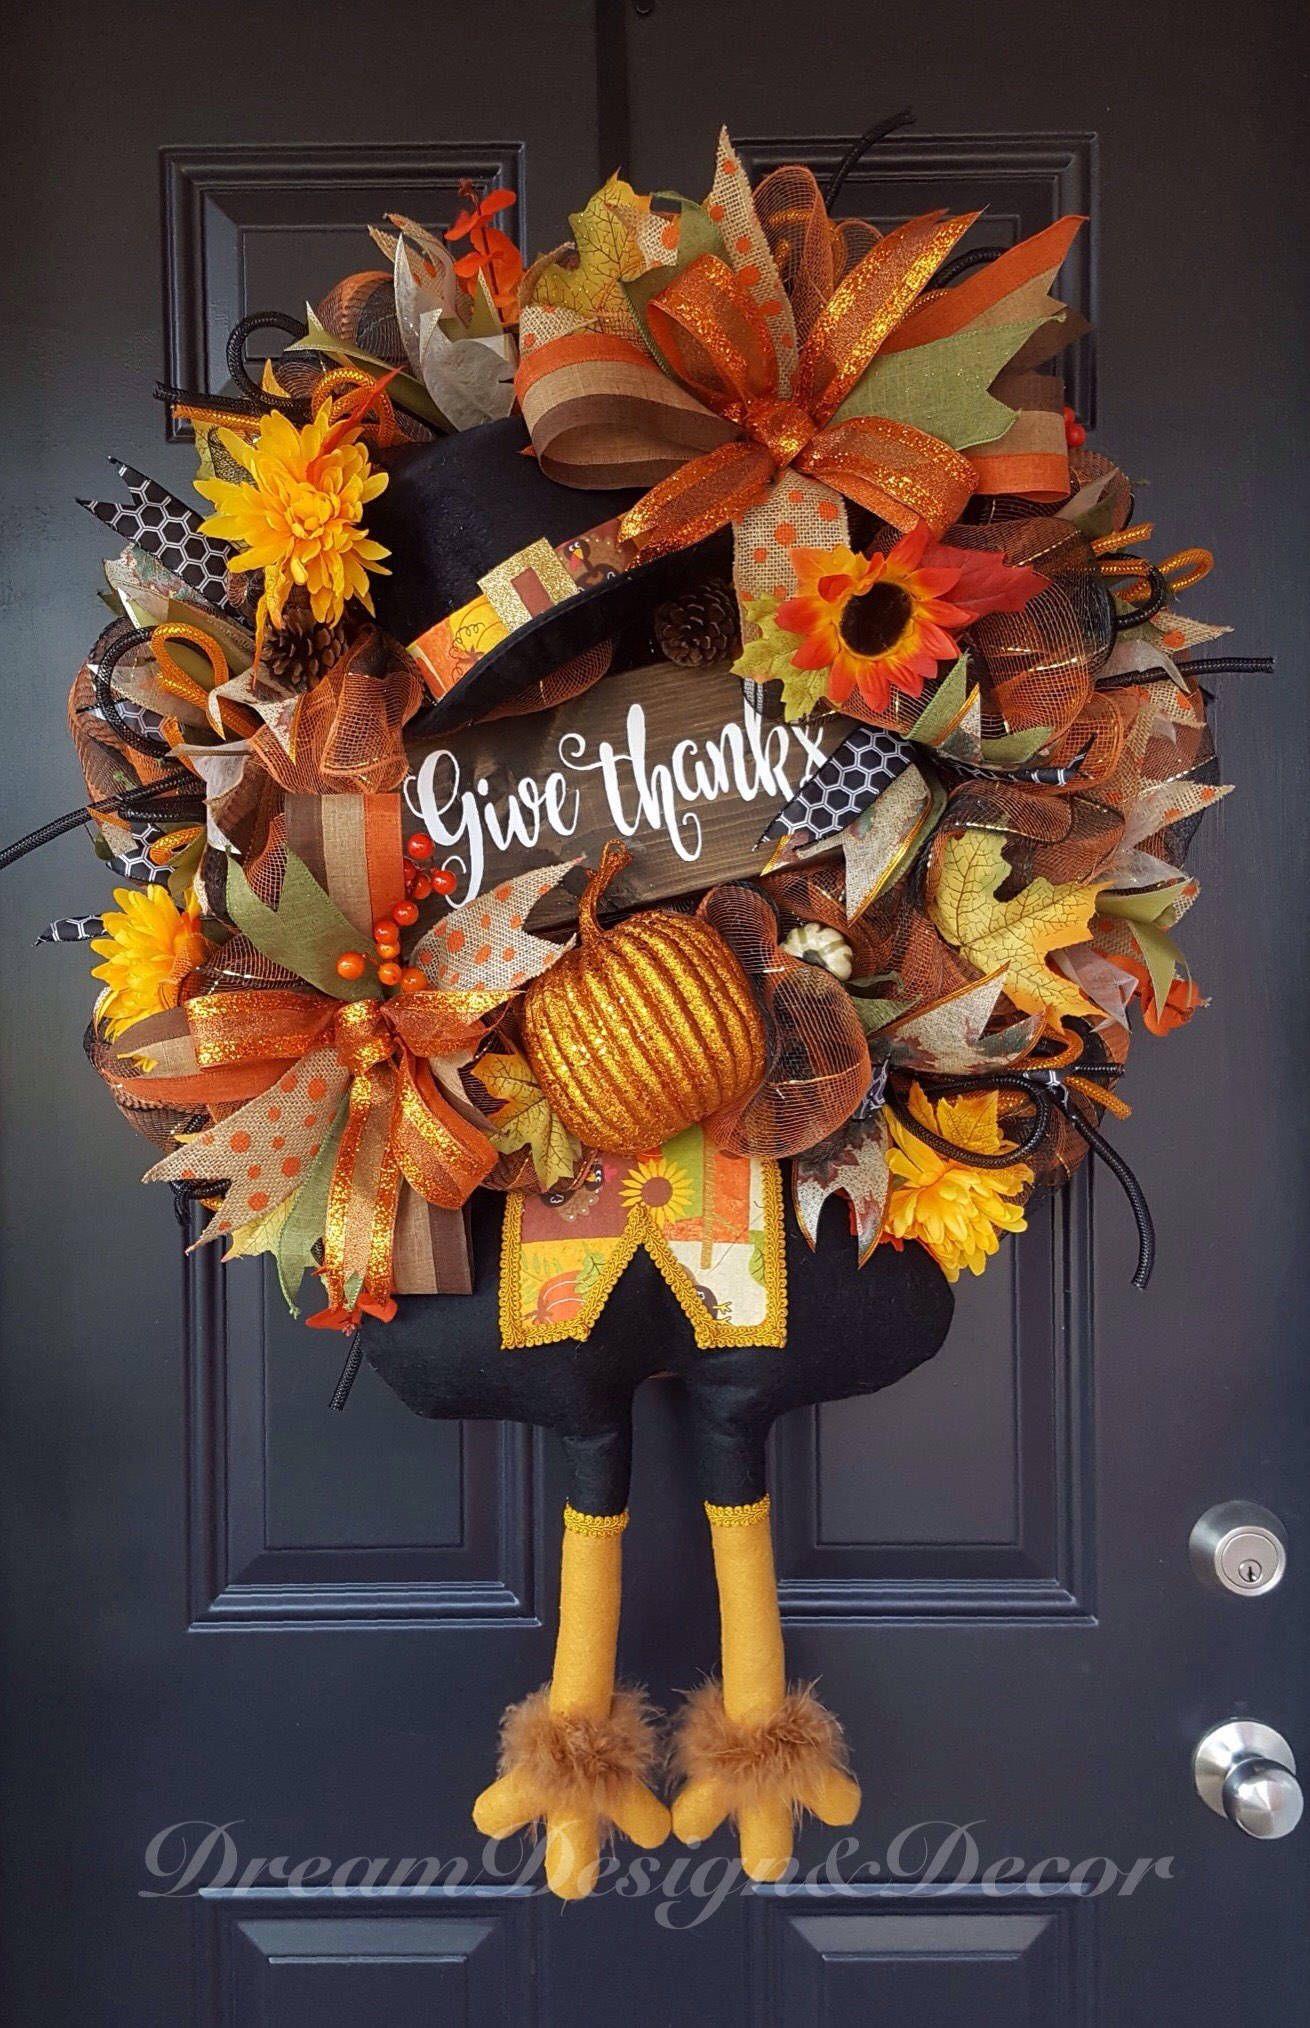 Thanksgiving Turkey Wreath Give Thanks By Dreamdesigndecorshop On Etsy Turkey Wreath Deco Mesh Wreaths Fall Decor